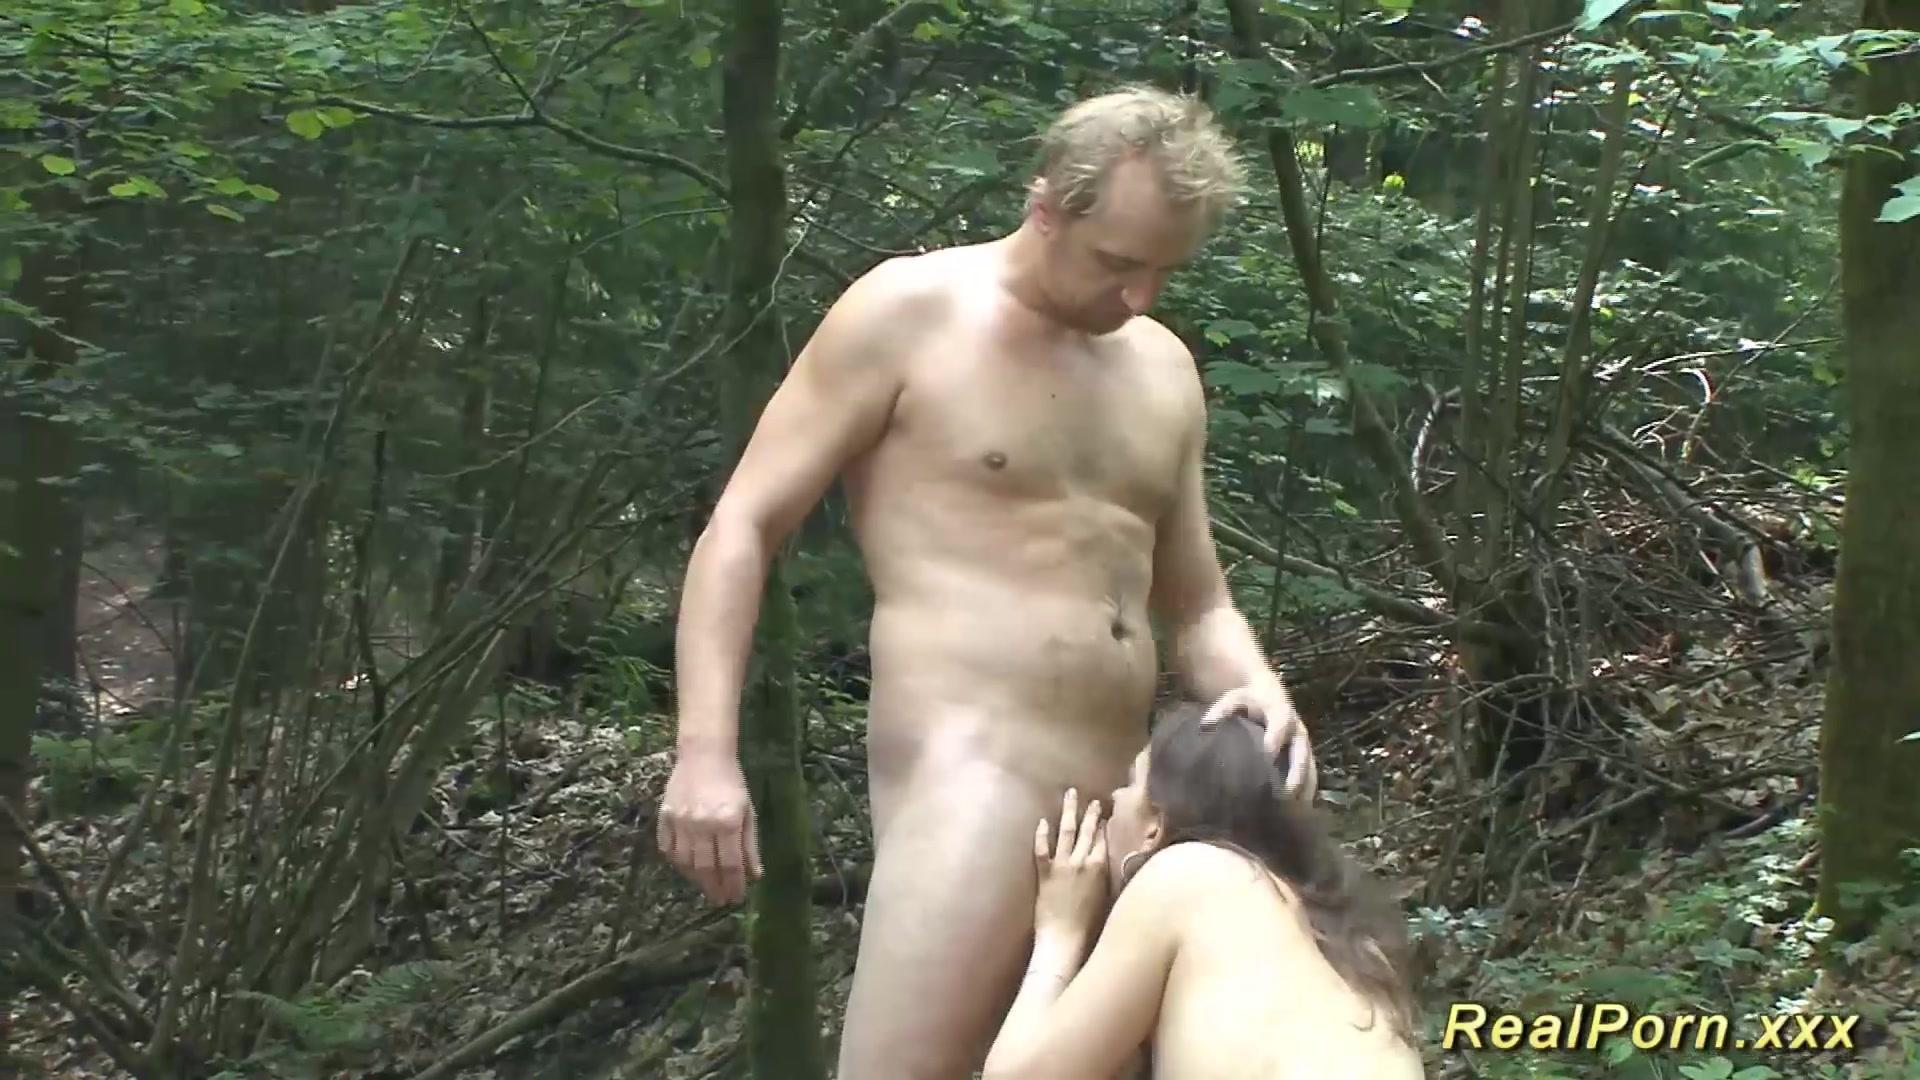 Quality porn Heraclito y parmenides yahoo dating